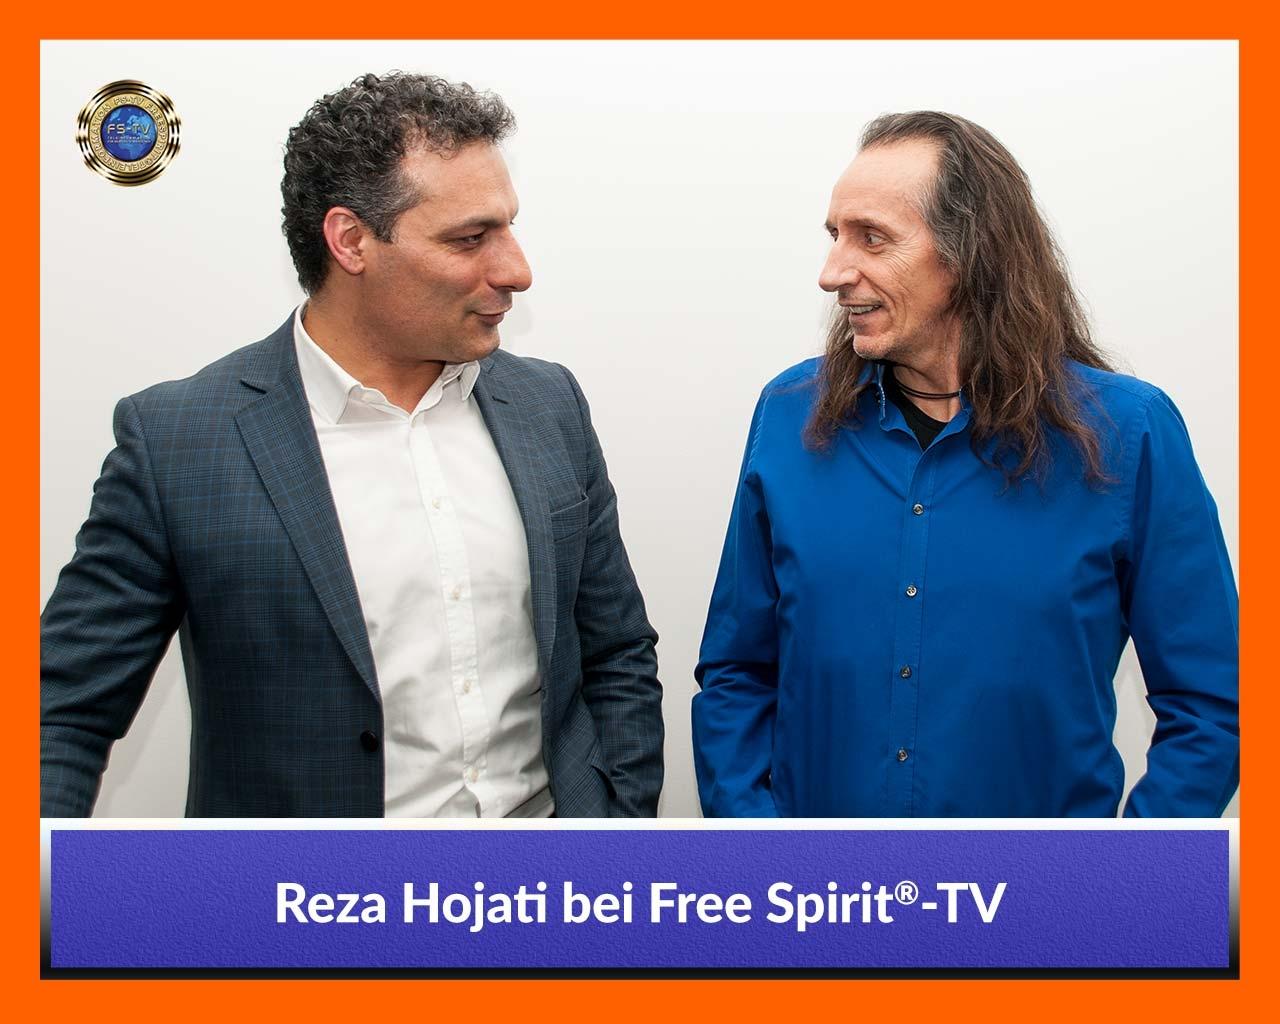 Reza-Hojati-07